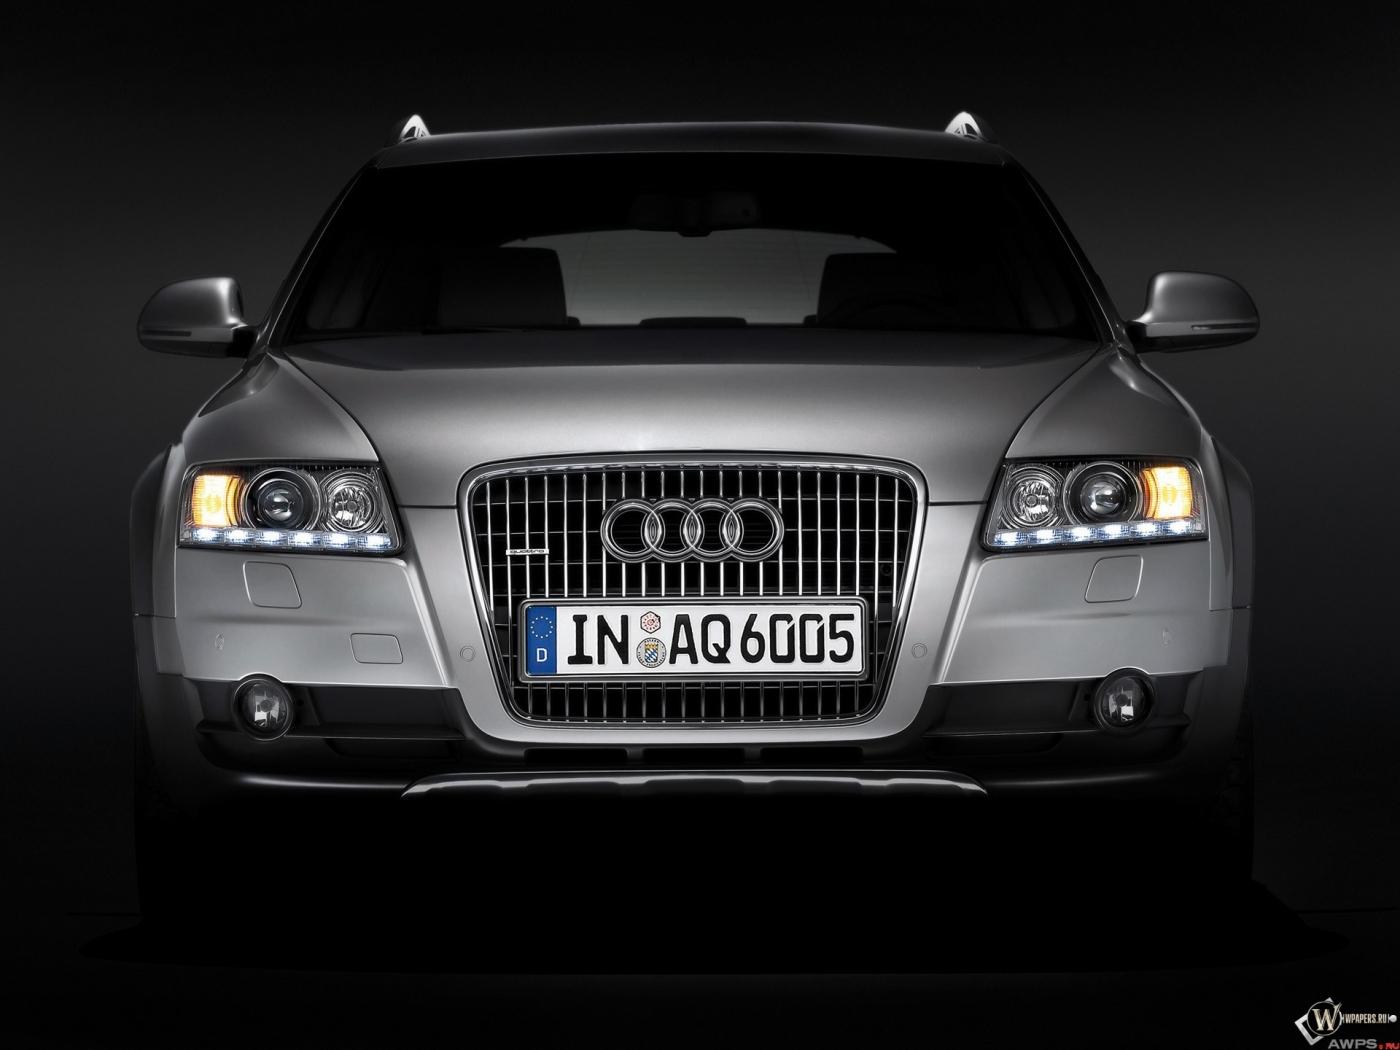 Скачать обои Ауди A6 Allroad (Audi Allroad, Audi A6) для ...: http://wpapers.ru/wallpapers/avto/Audi/518/1400-1050_%D0%90%D1%83%D0%B4%D0%B8-A6-Allroad.html